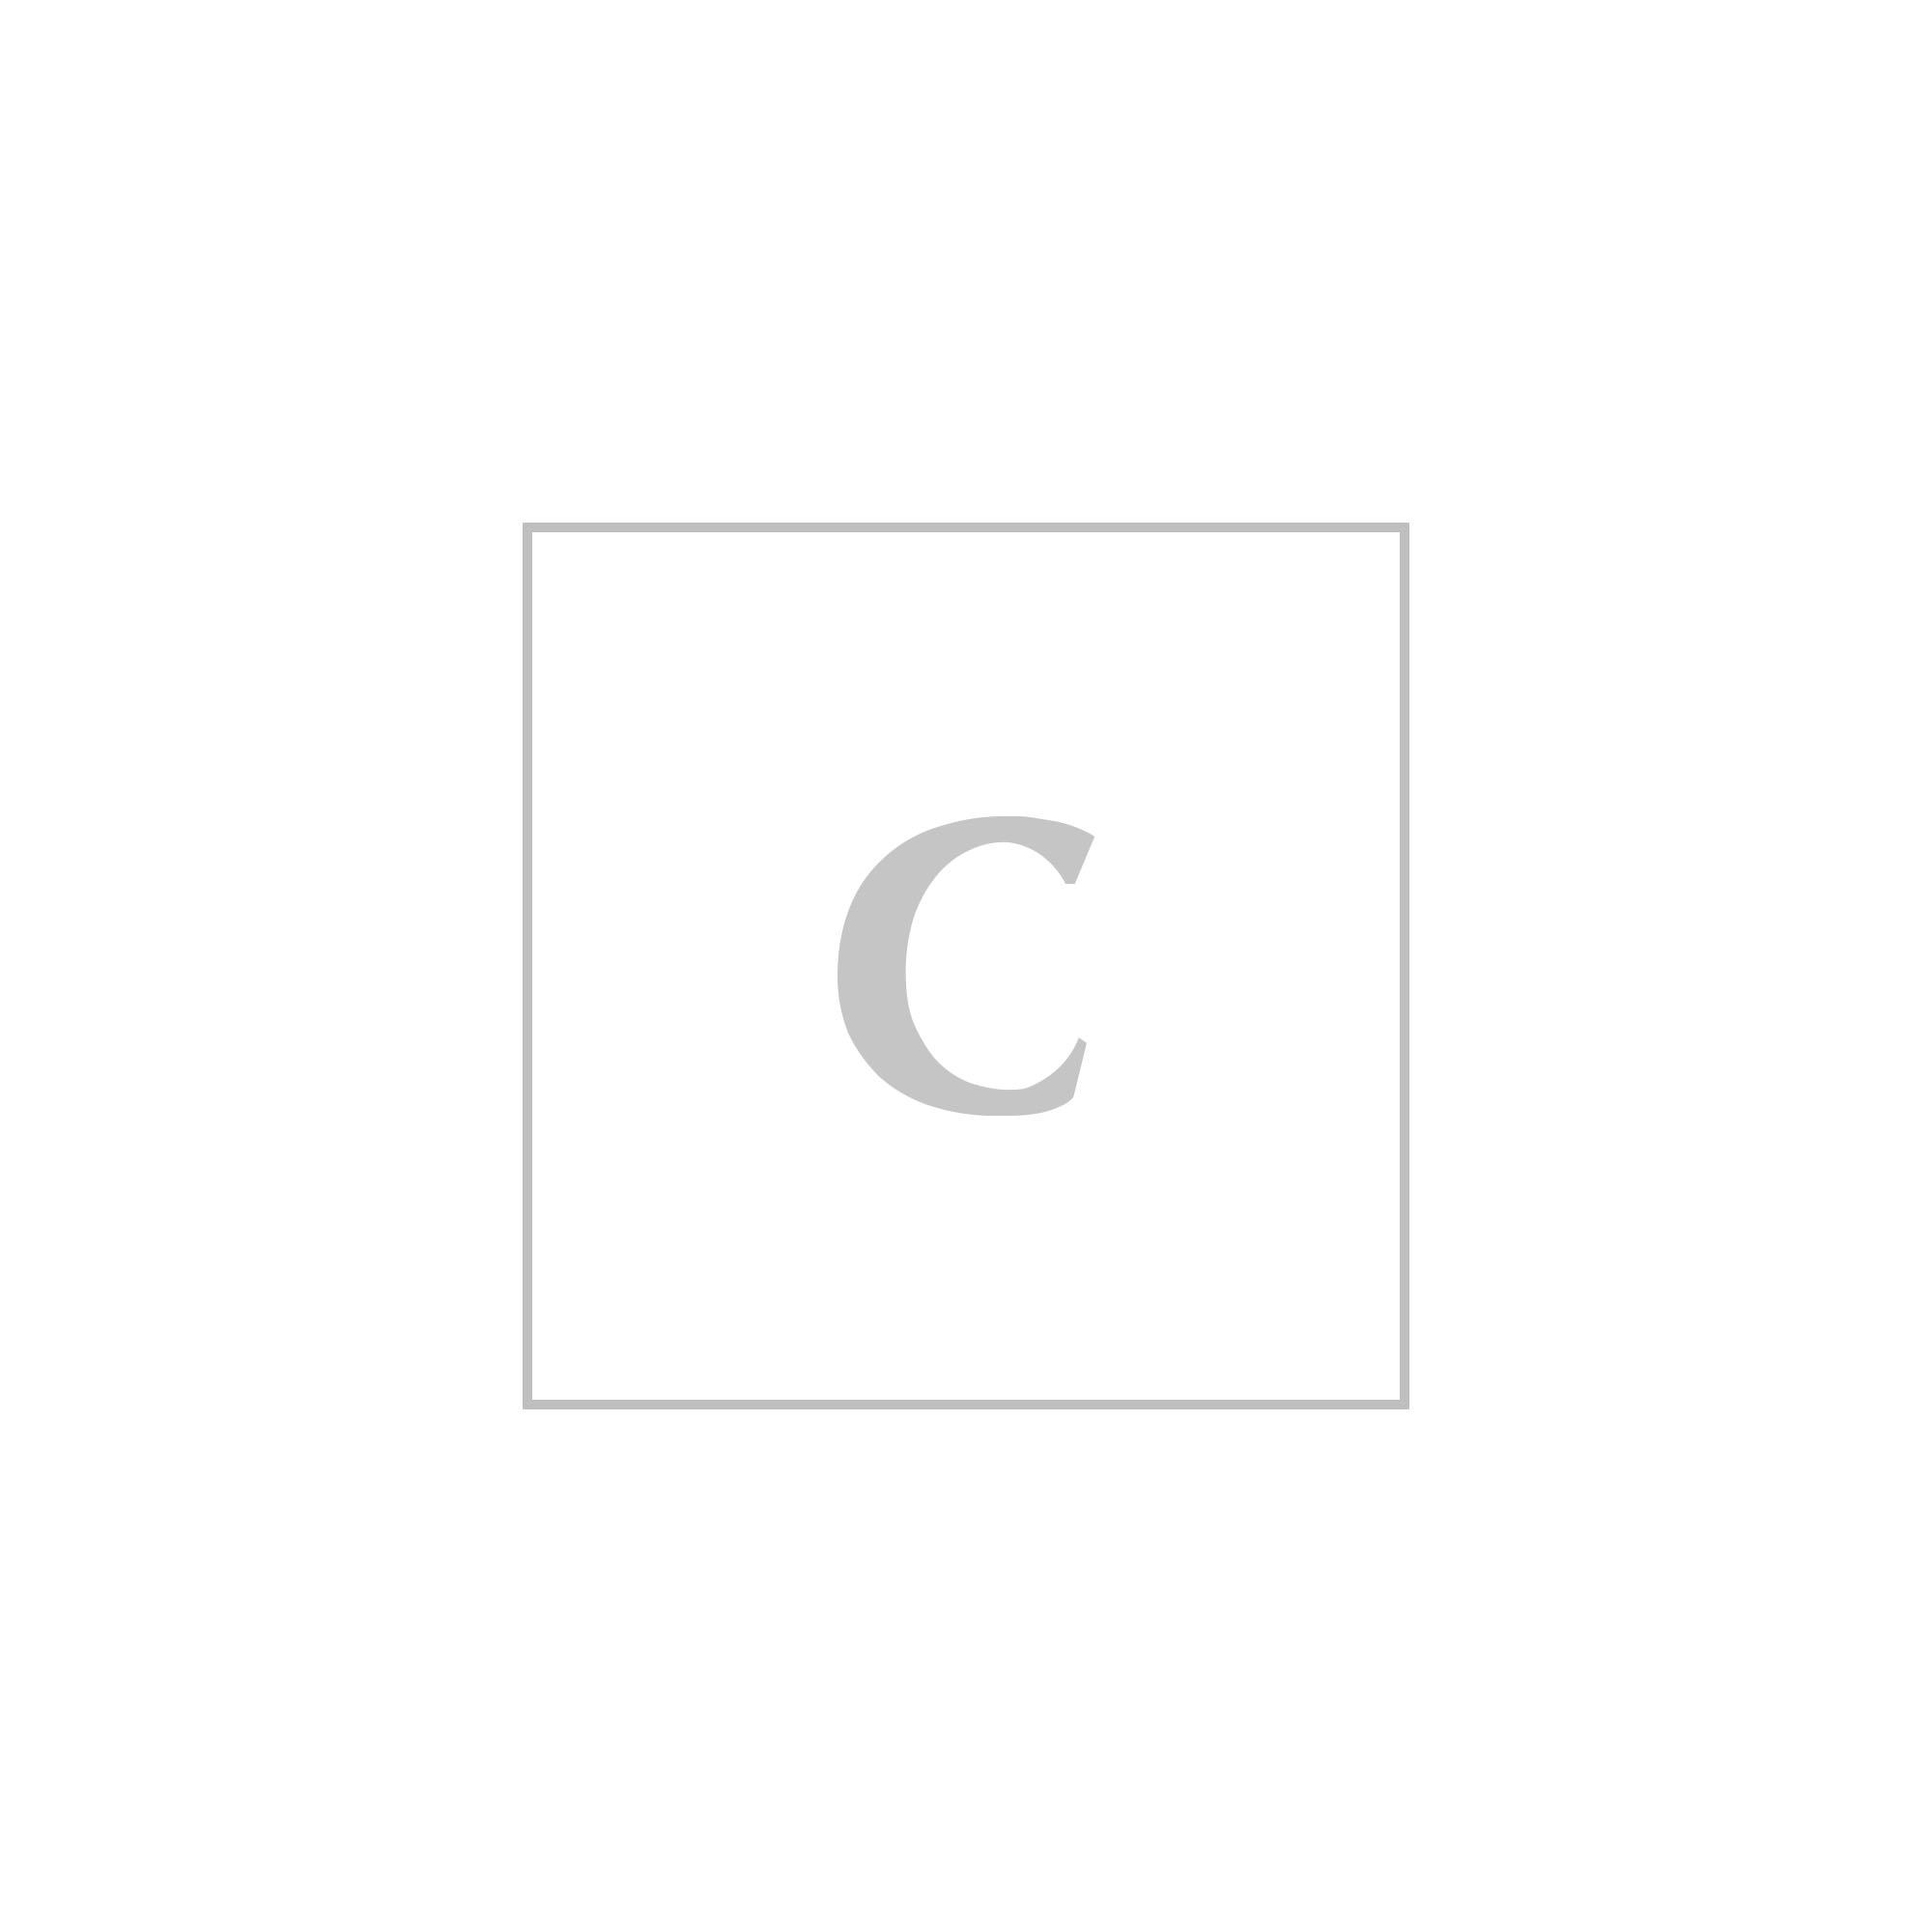 Dolce & gabbana p.foglio dauphine stampata